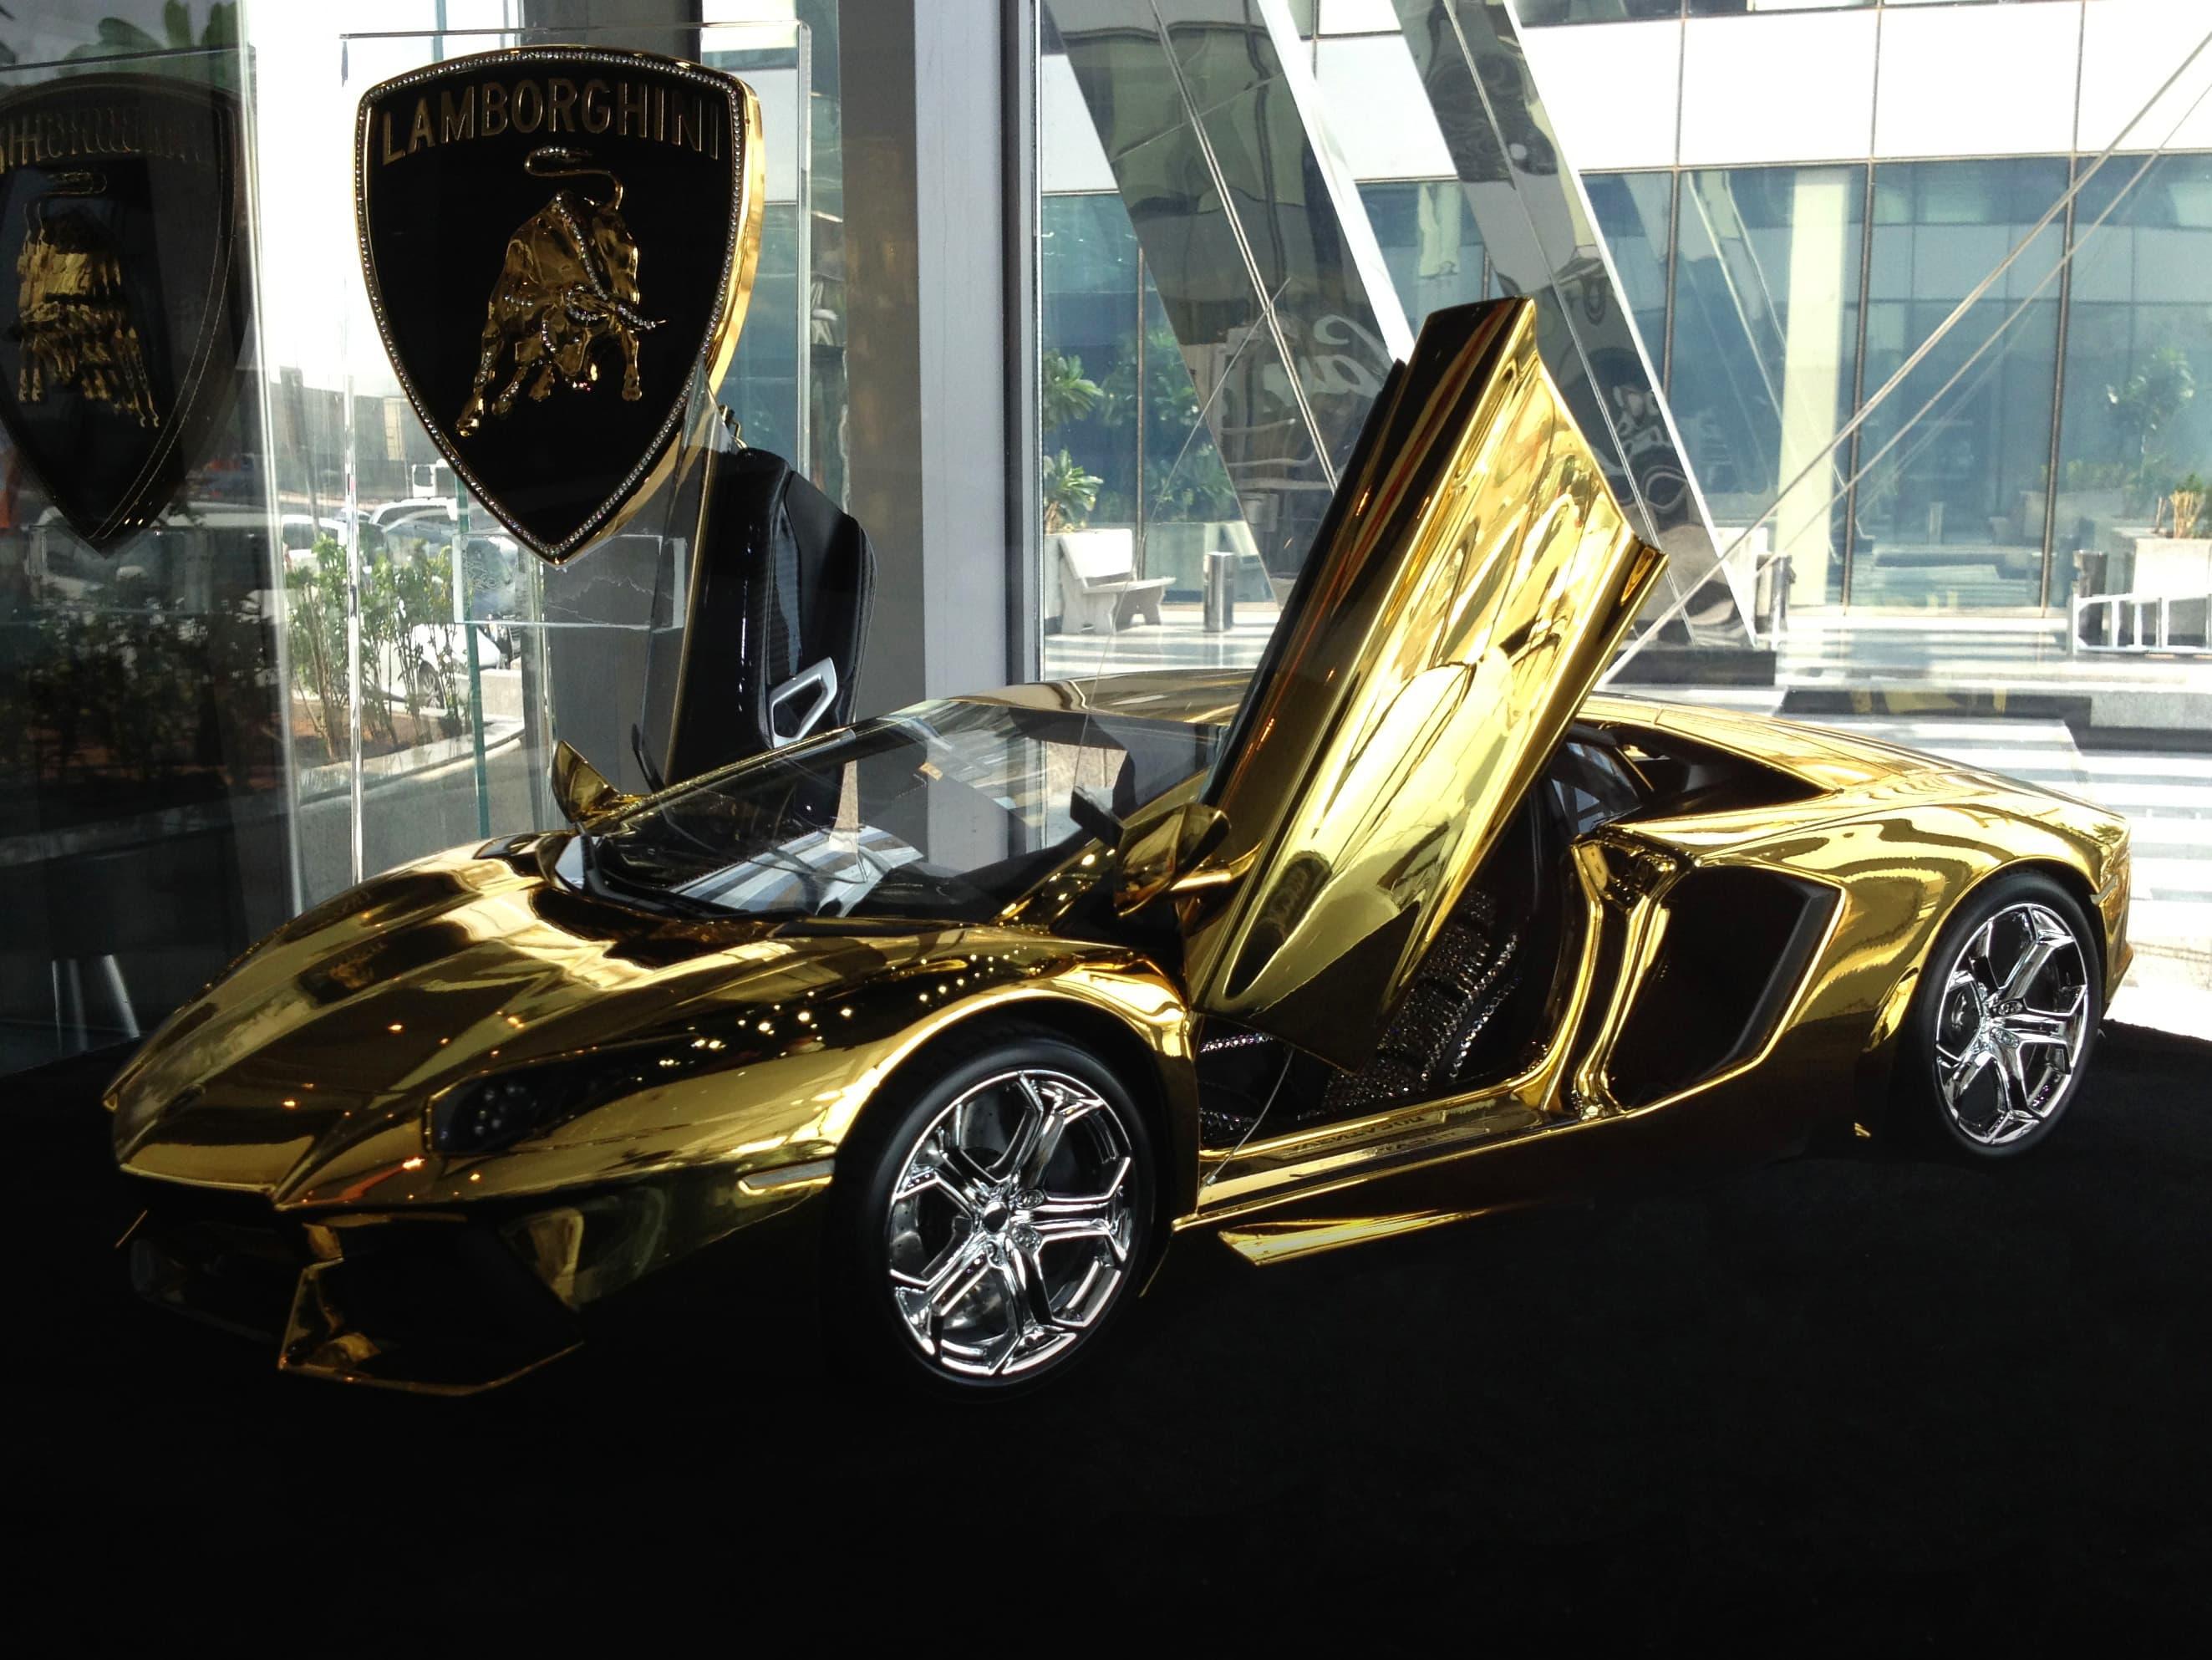 Gold Lamborghini Yours for $7.5 million